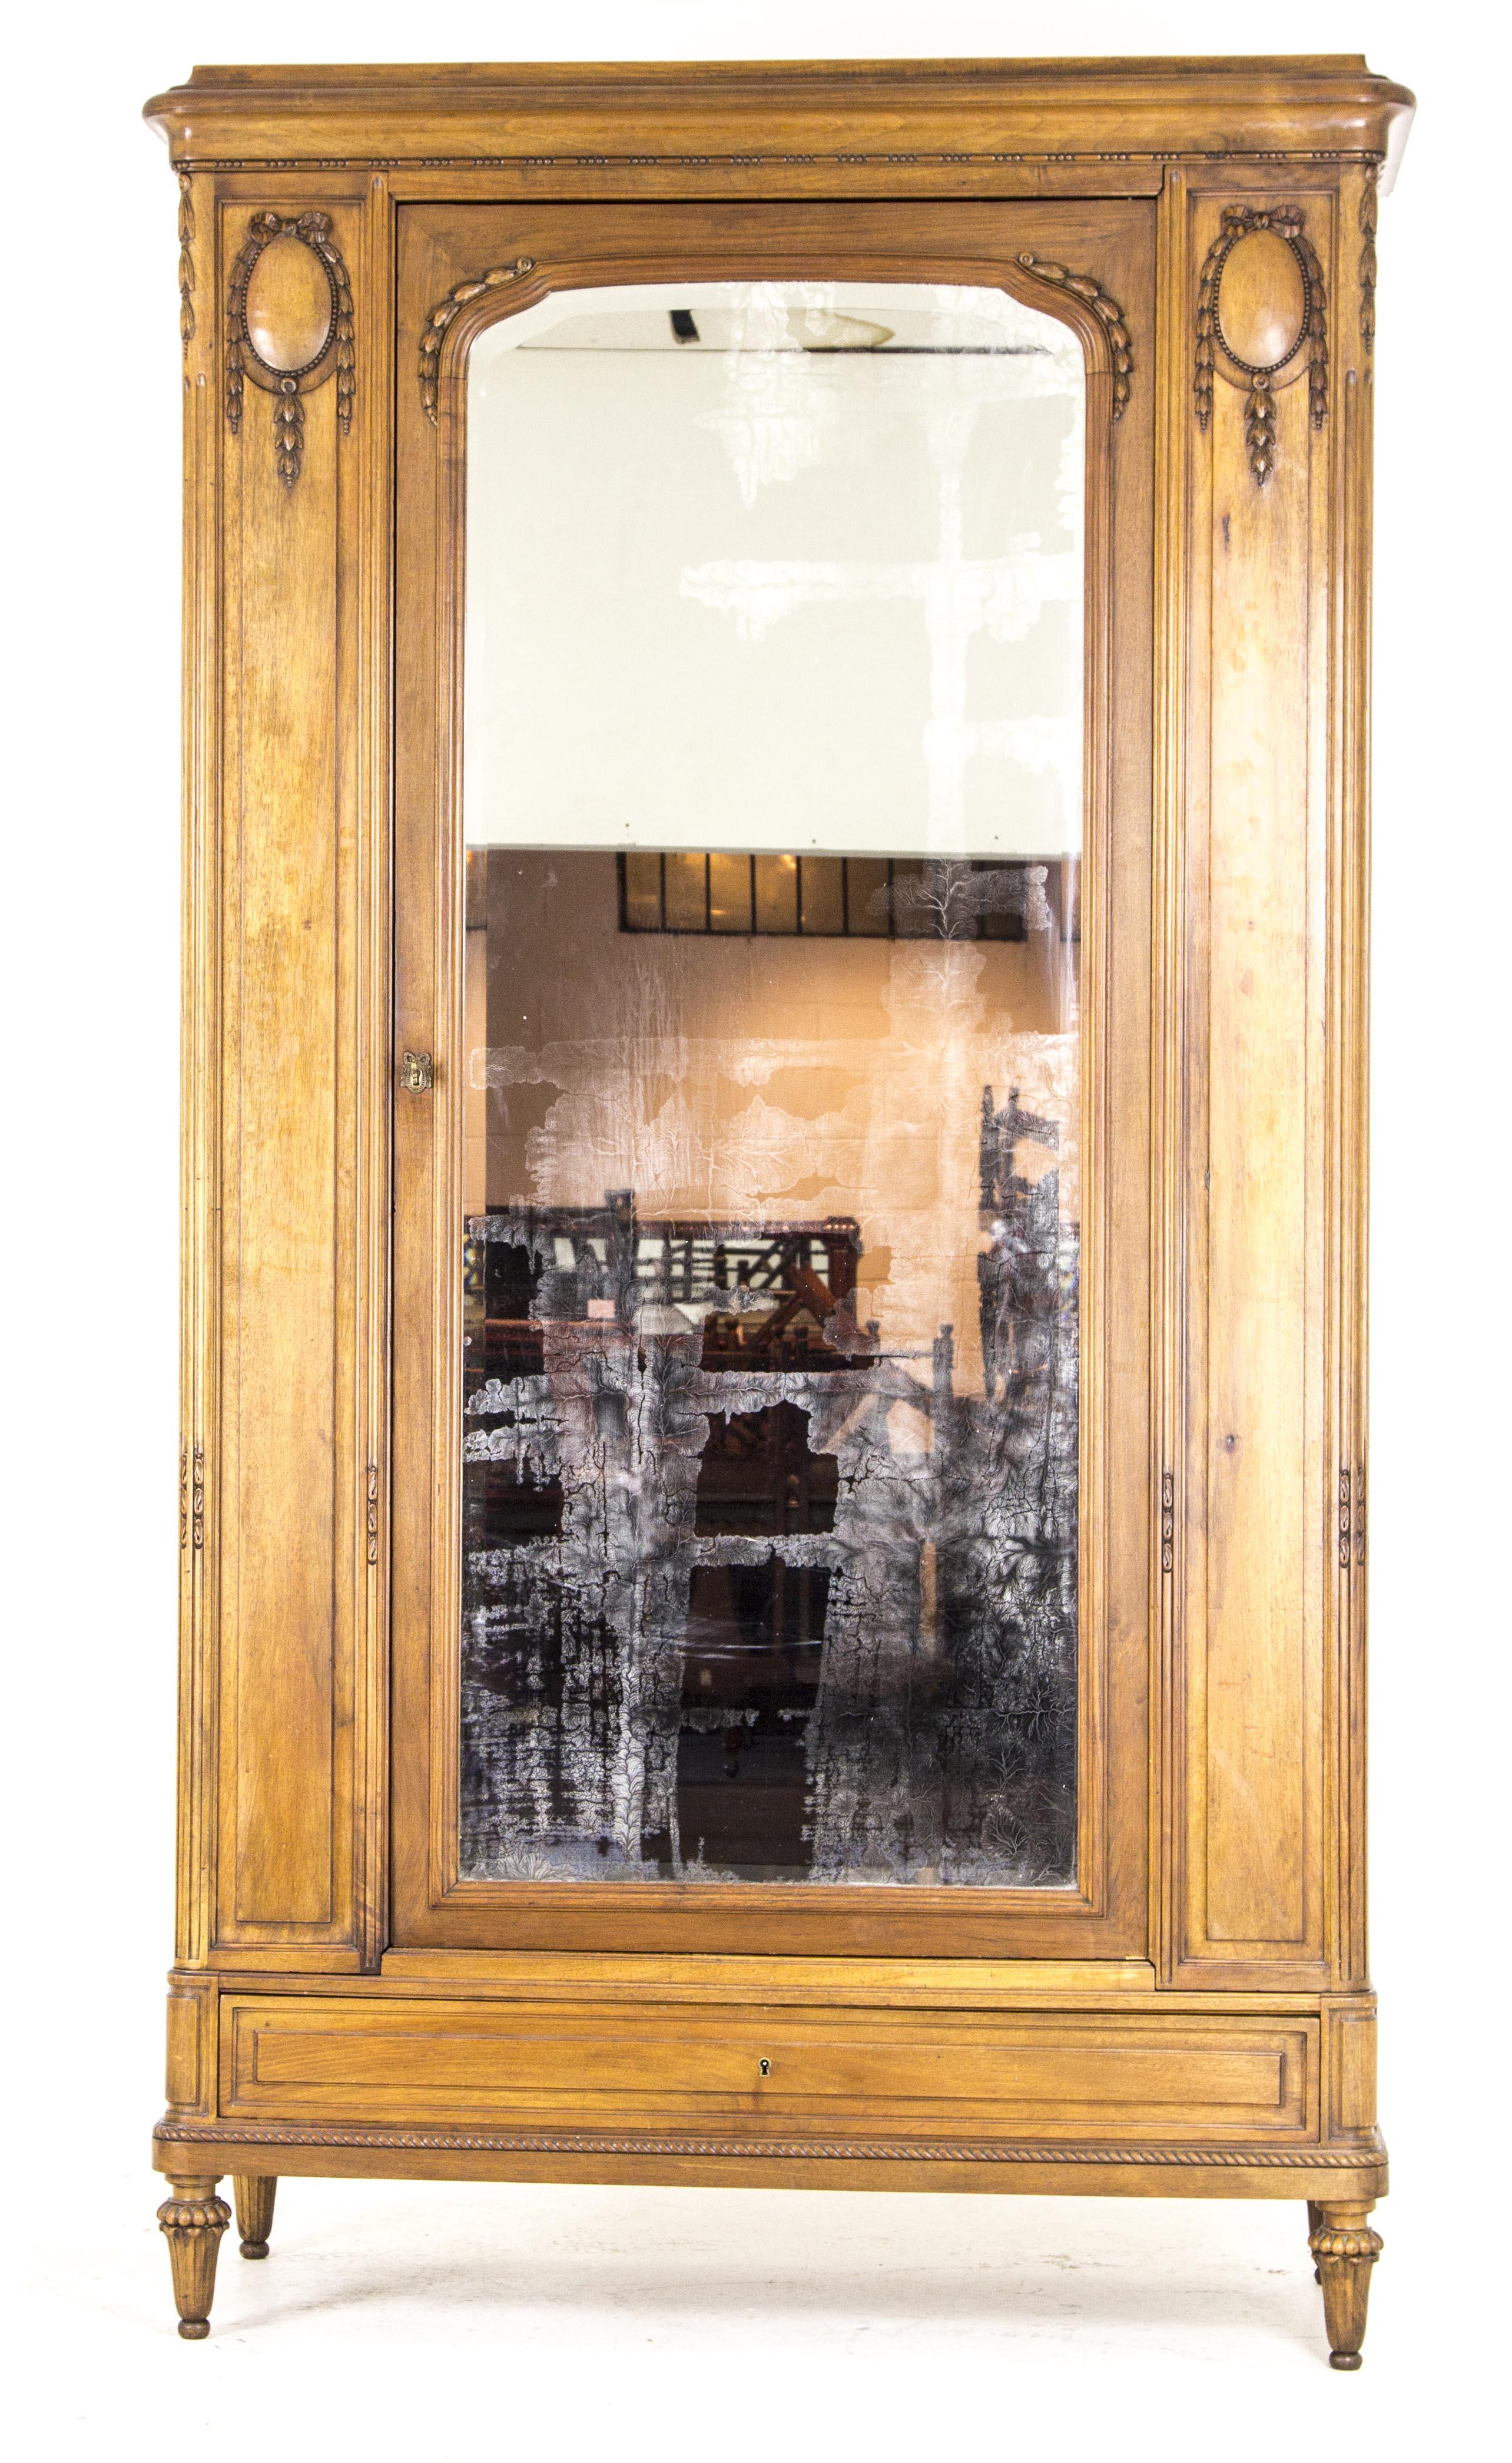 Charmant B626 Antique French Walnut Single Door Armoire, Wardrobe, Closet With  Beveled Mirror